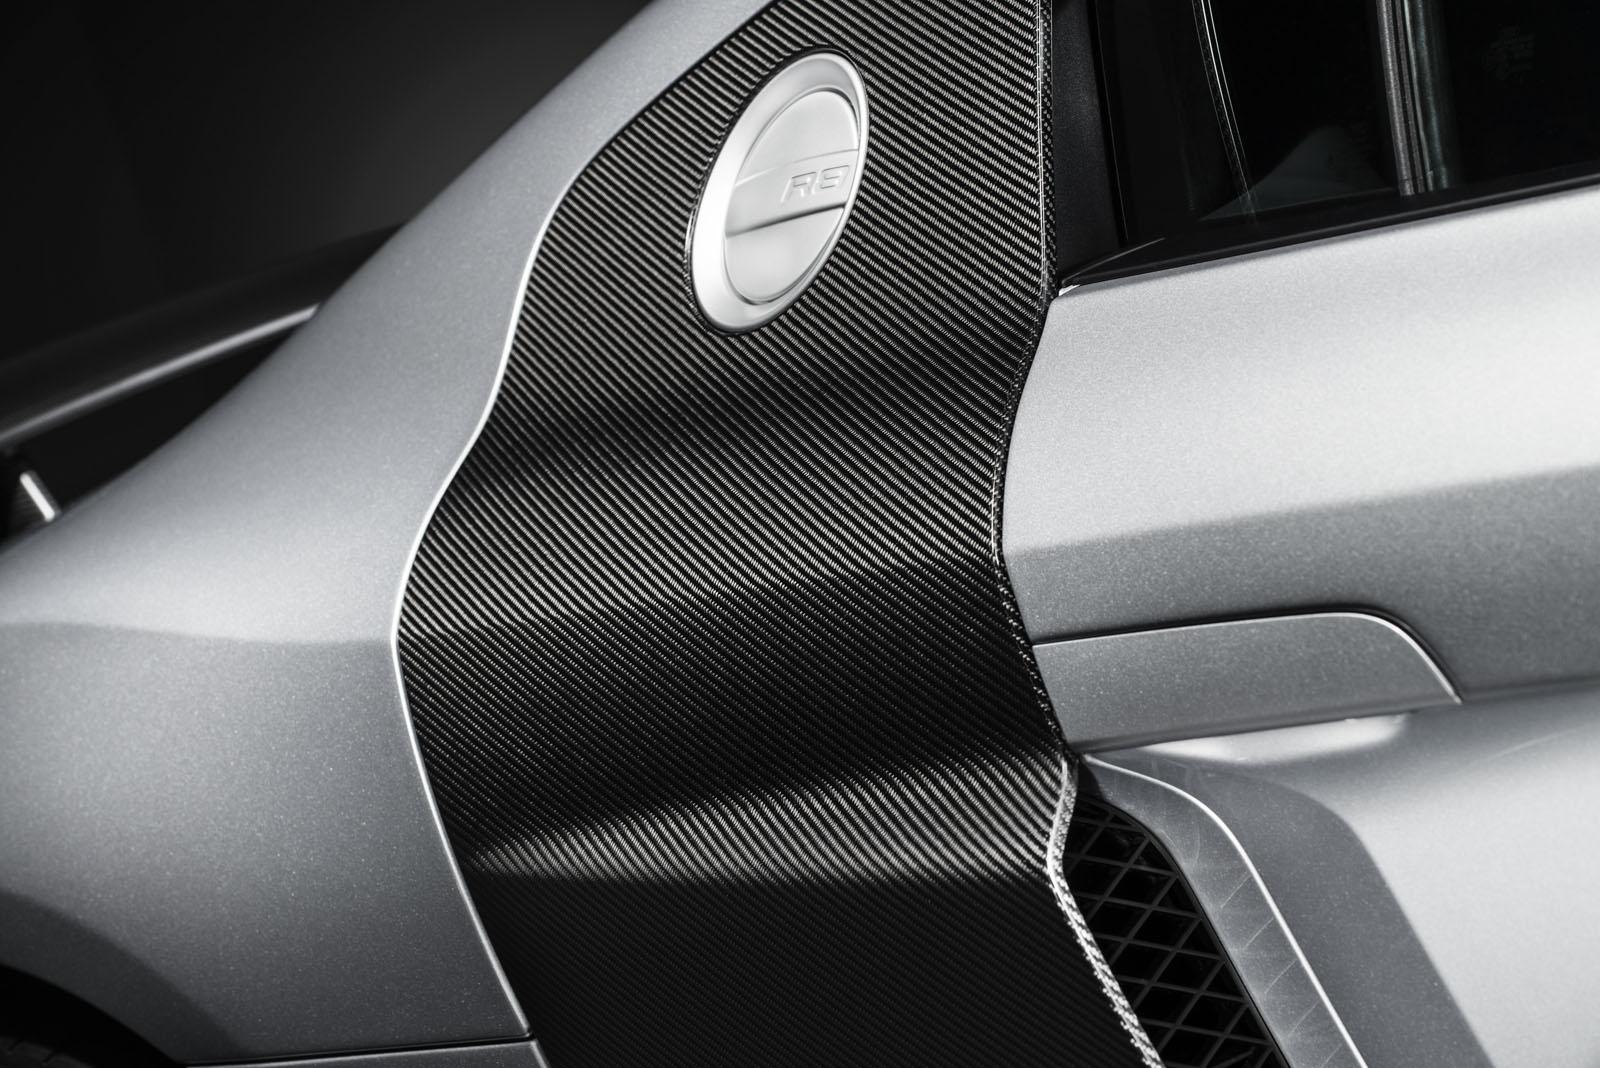 Audi R8 Competition fuel filler